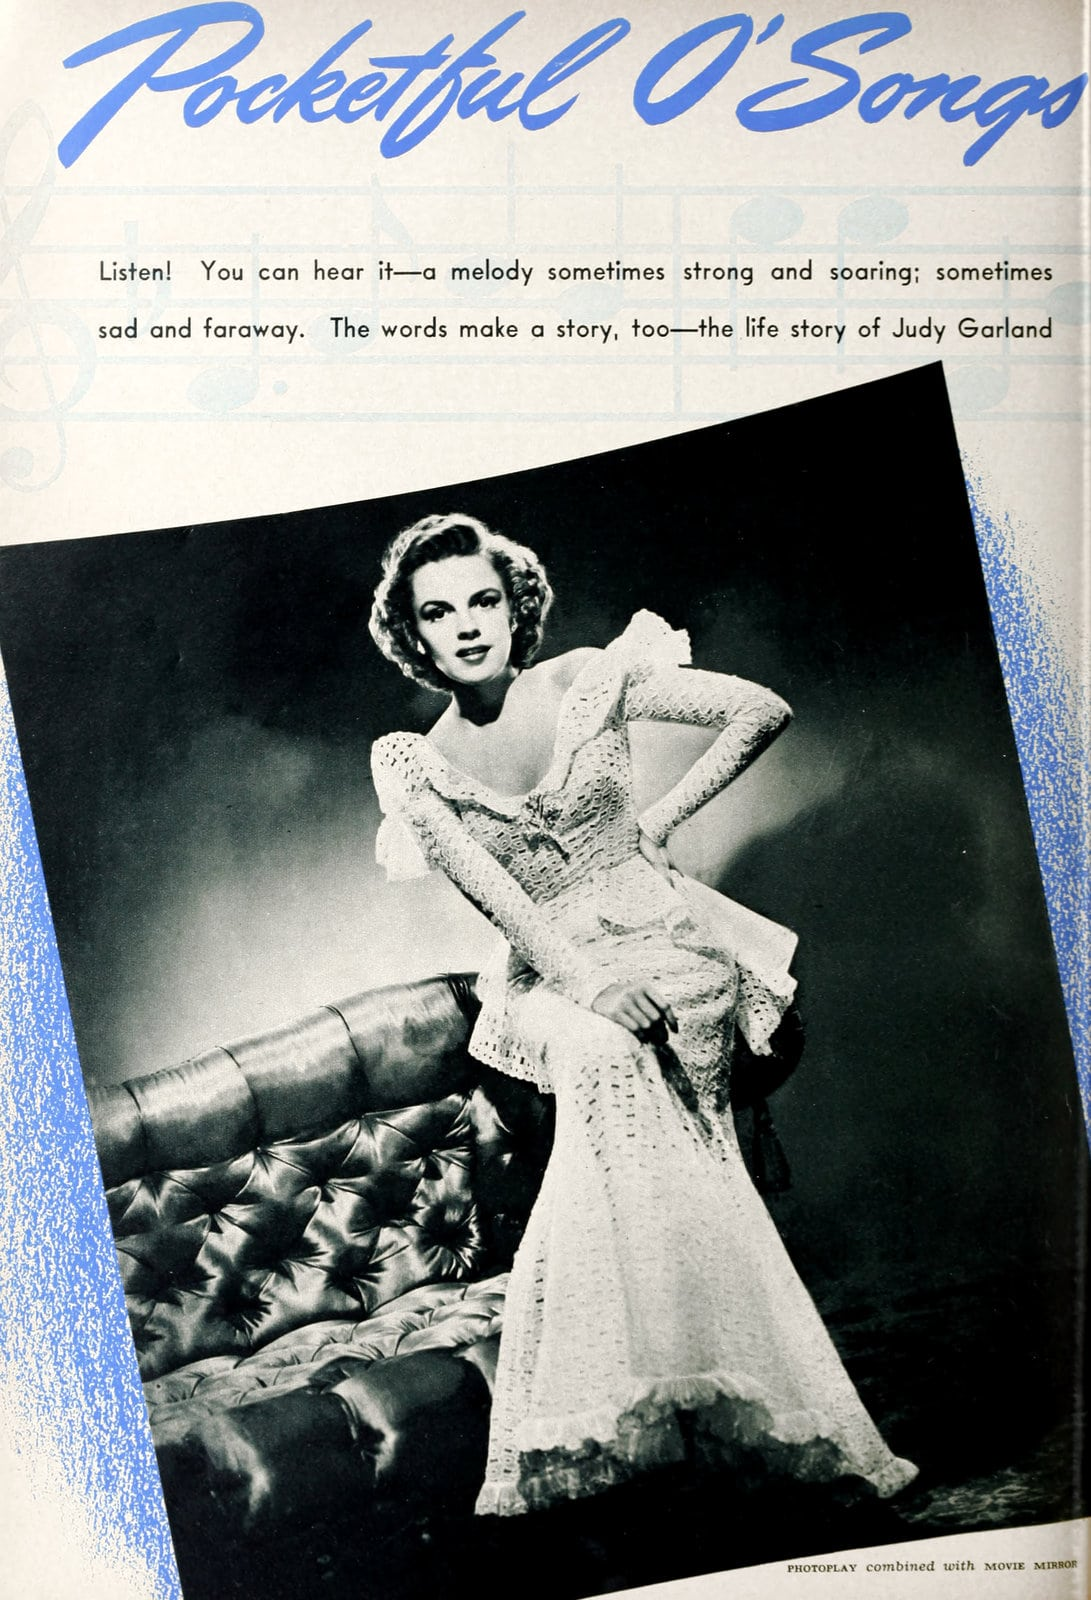 How Judy Garland's career began (1942)